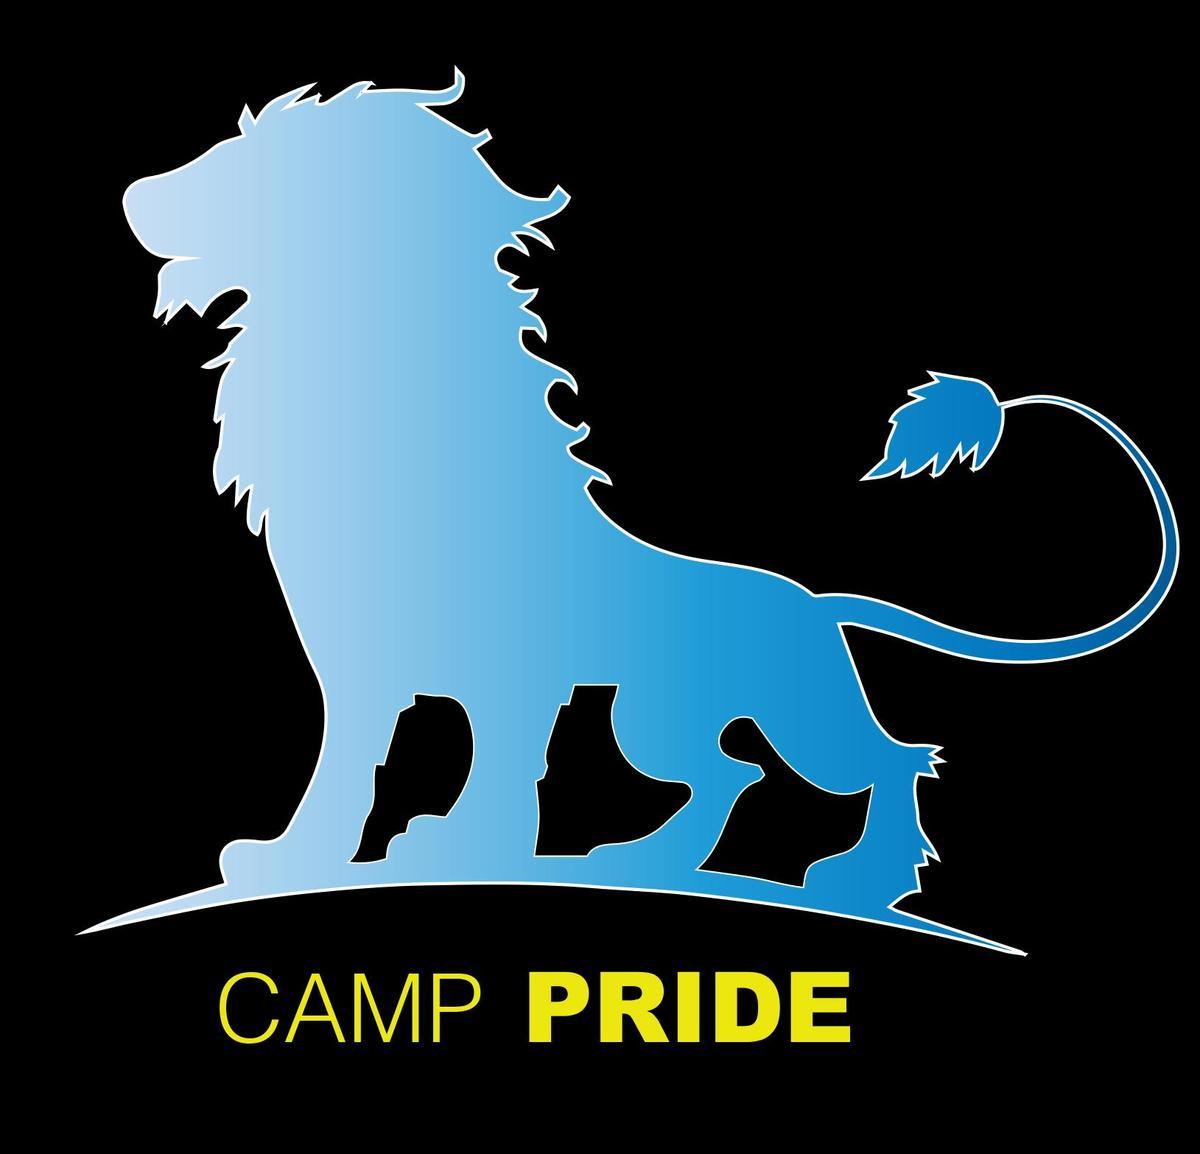 camp pride logo